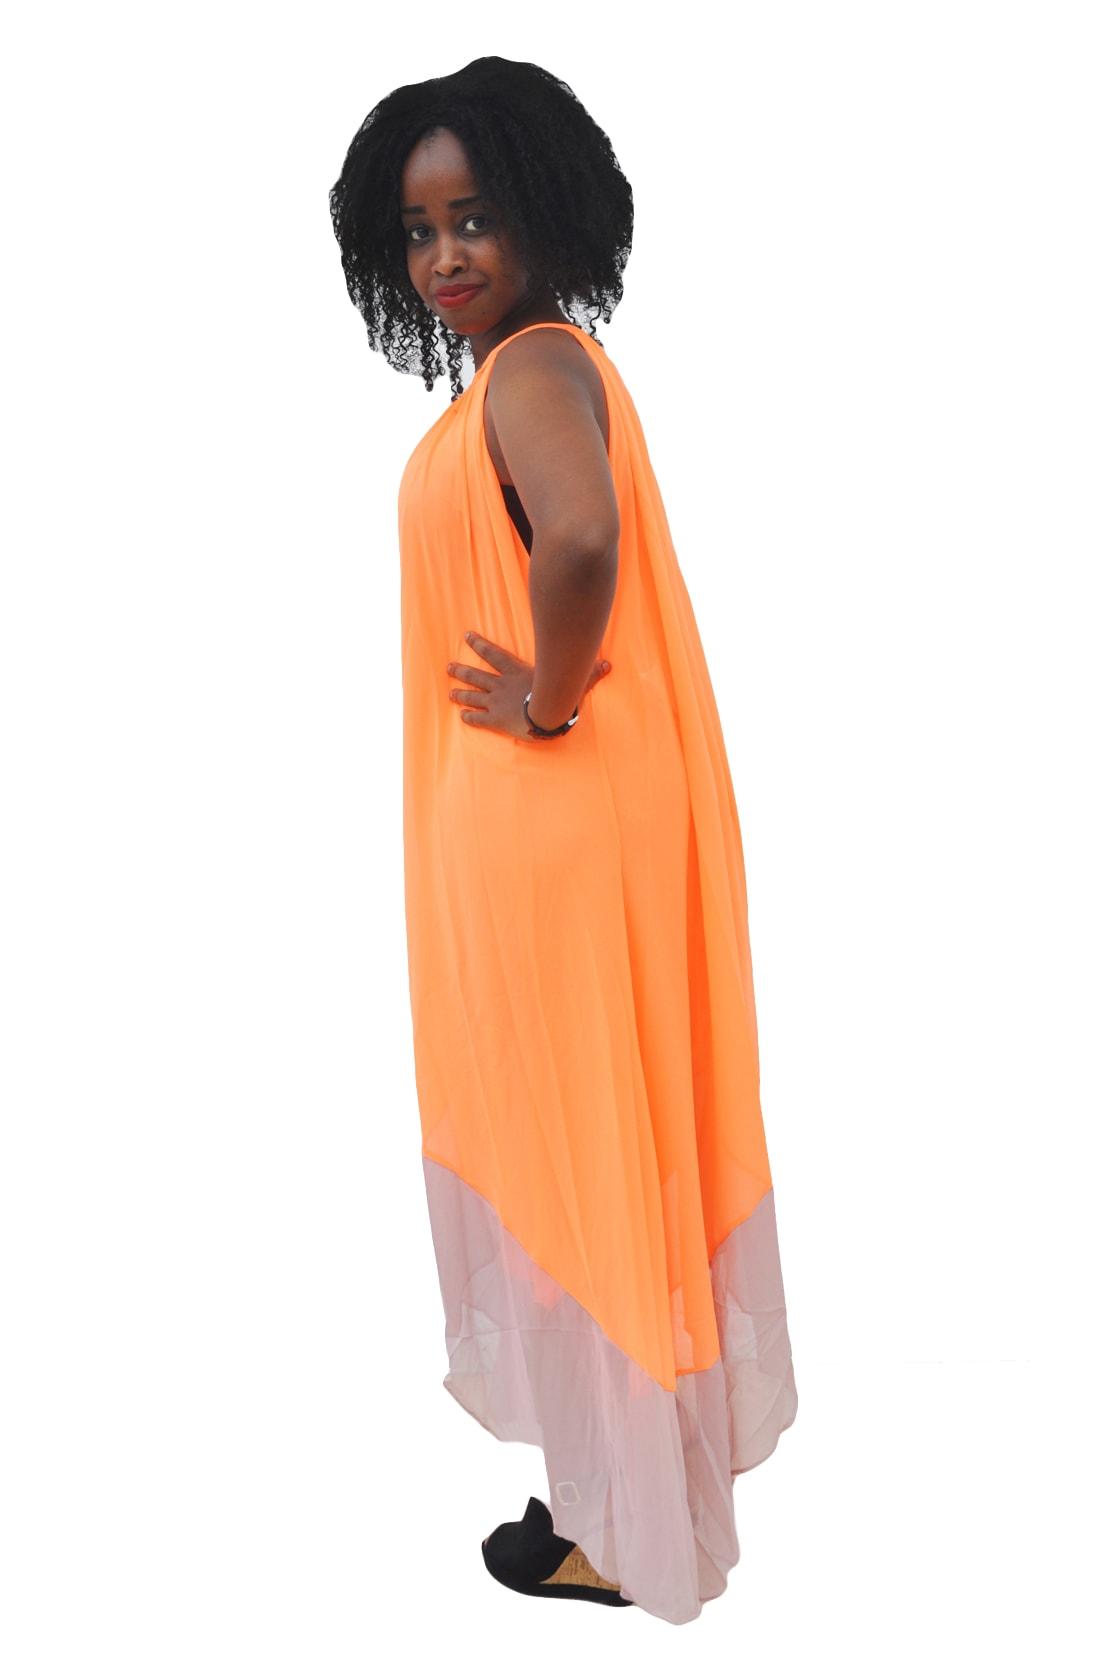 M0279 orange2 High Low Dresses maureens.com boutique